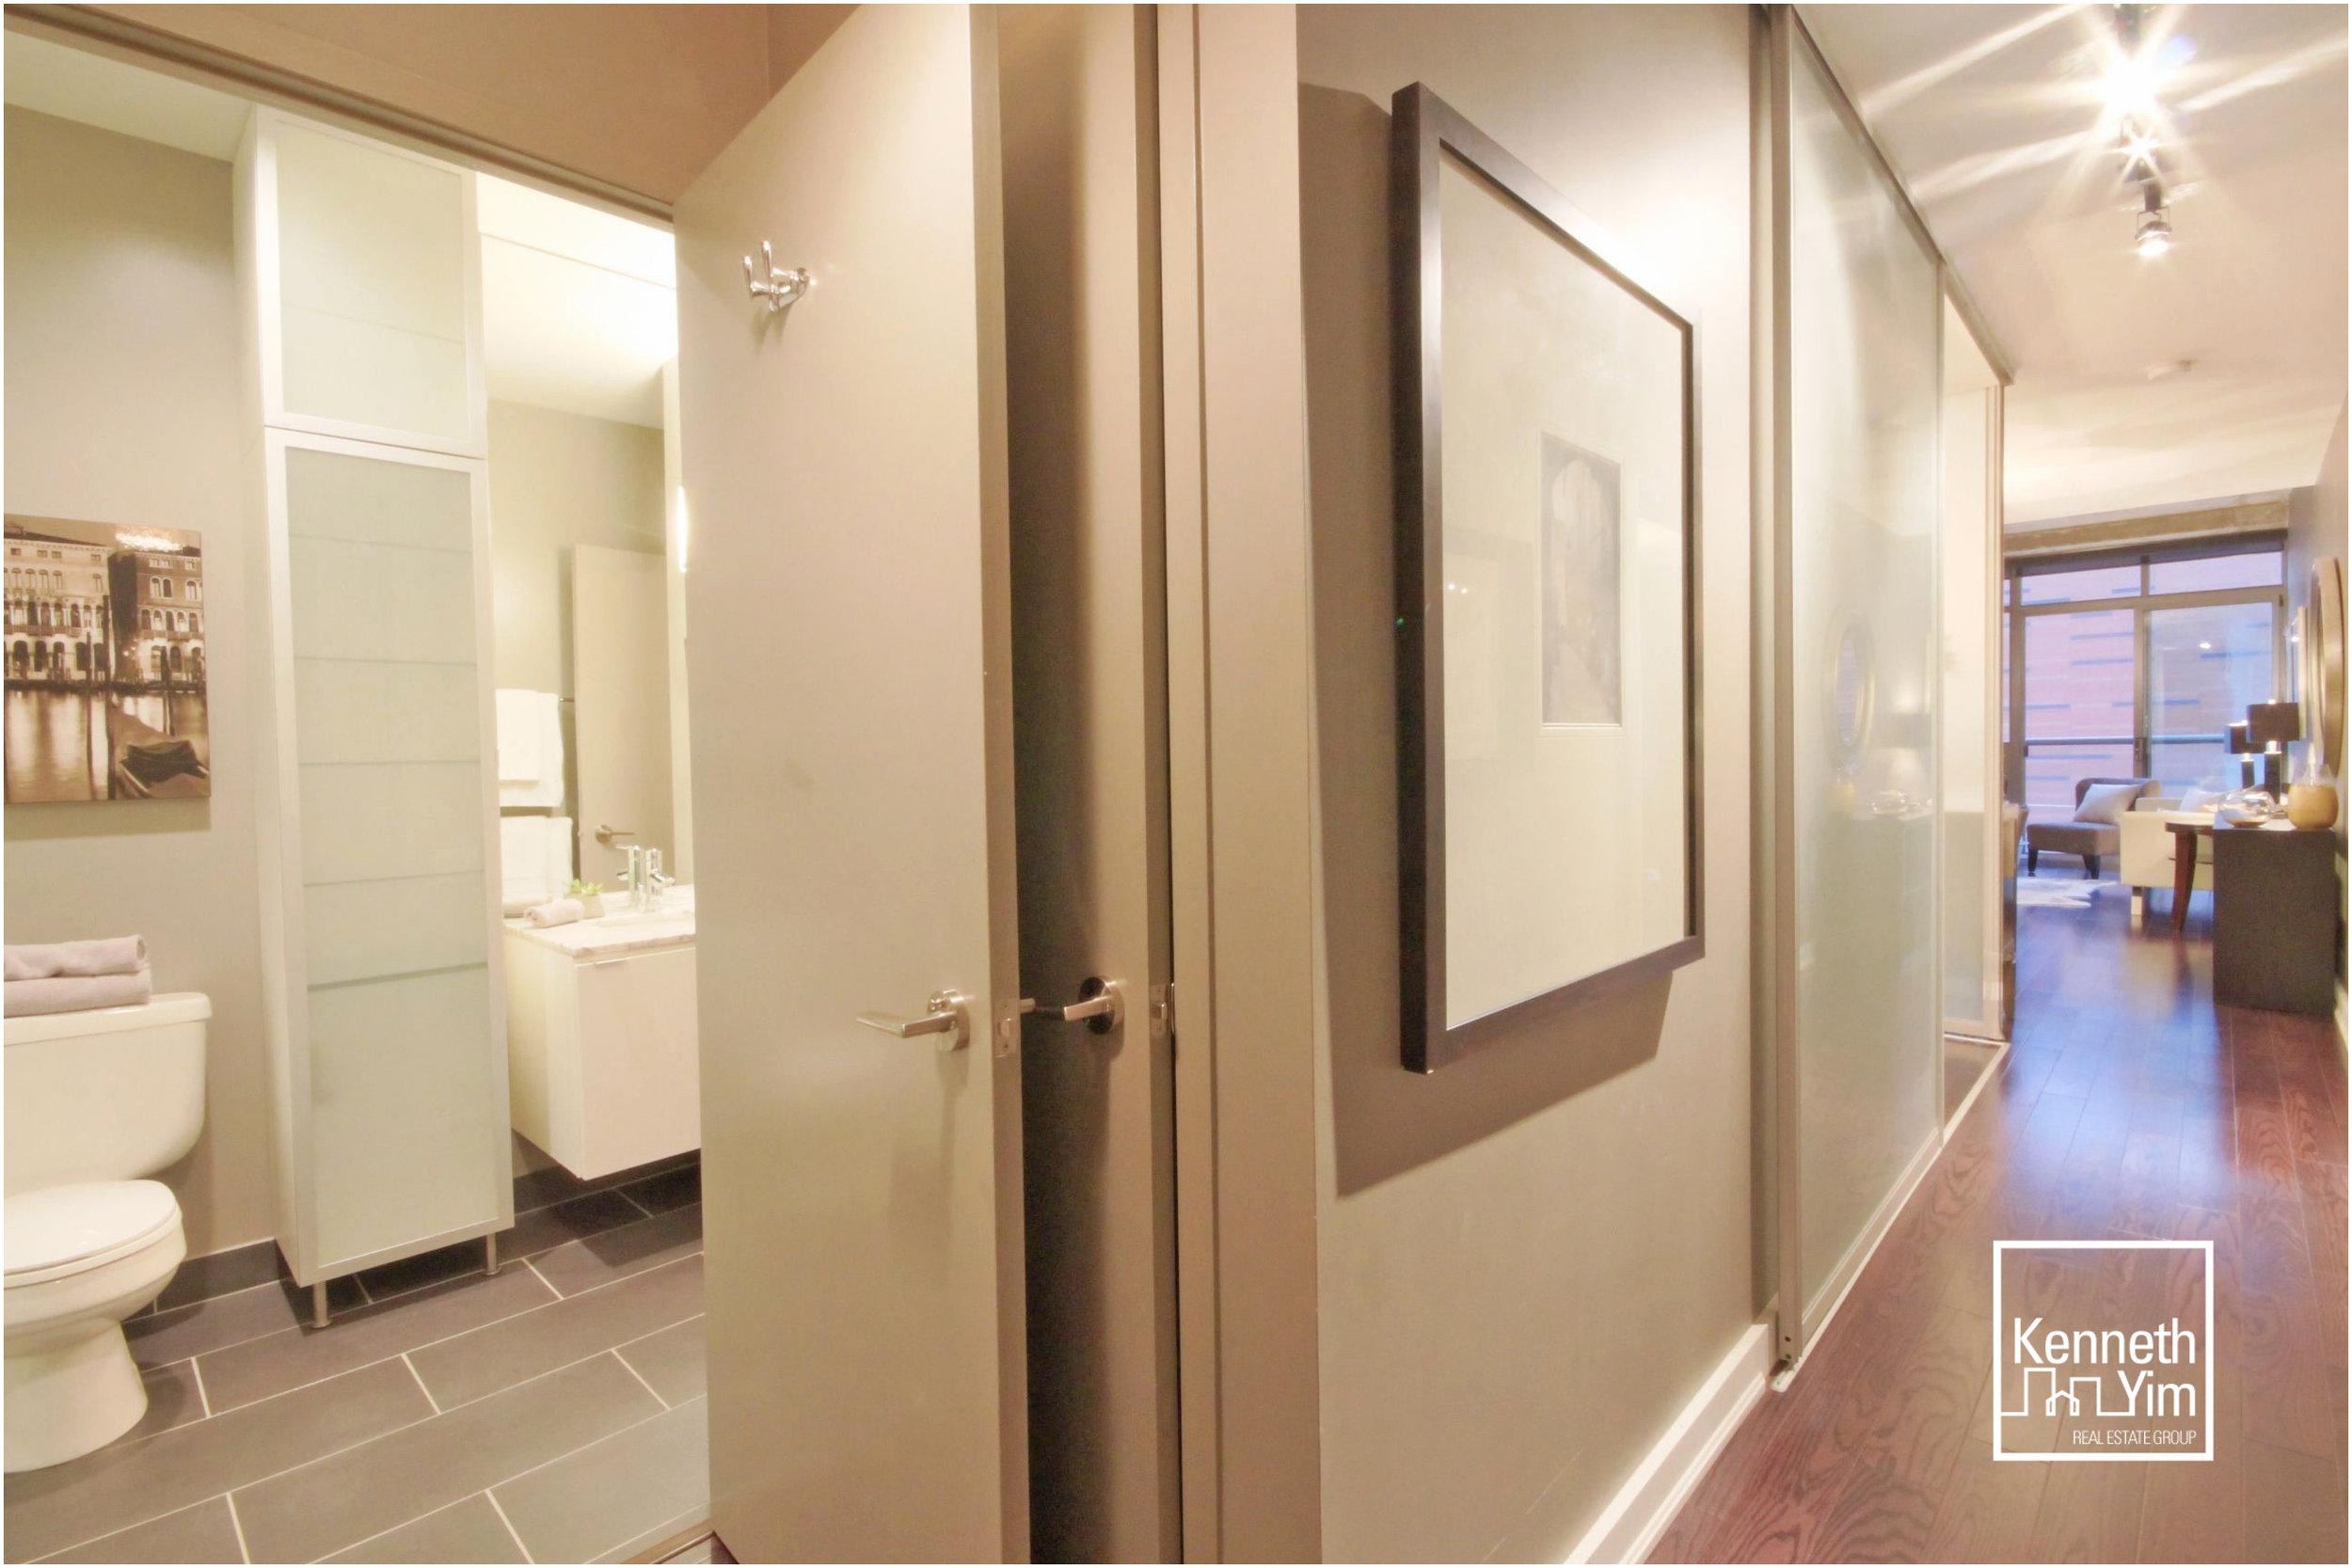 07 Hallway.jpg